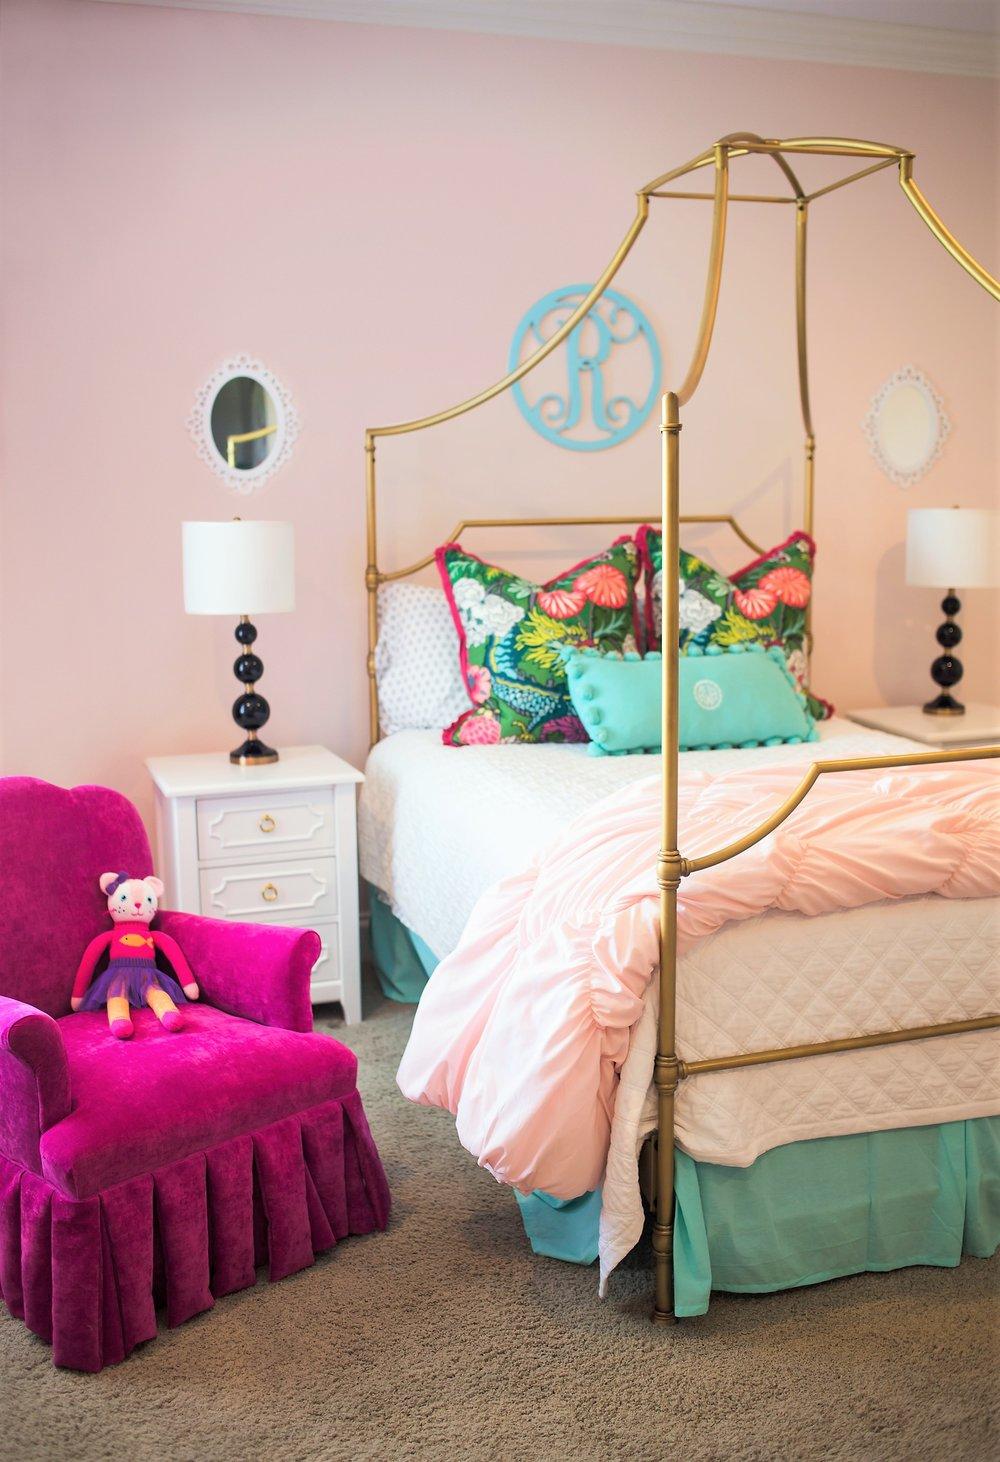 ellebrightdesigns.pinkgirlsroom.goldcanopybed.pinkchair.chiangmai